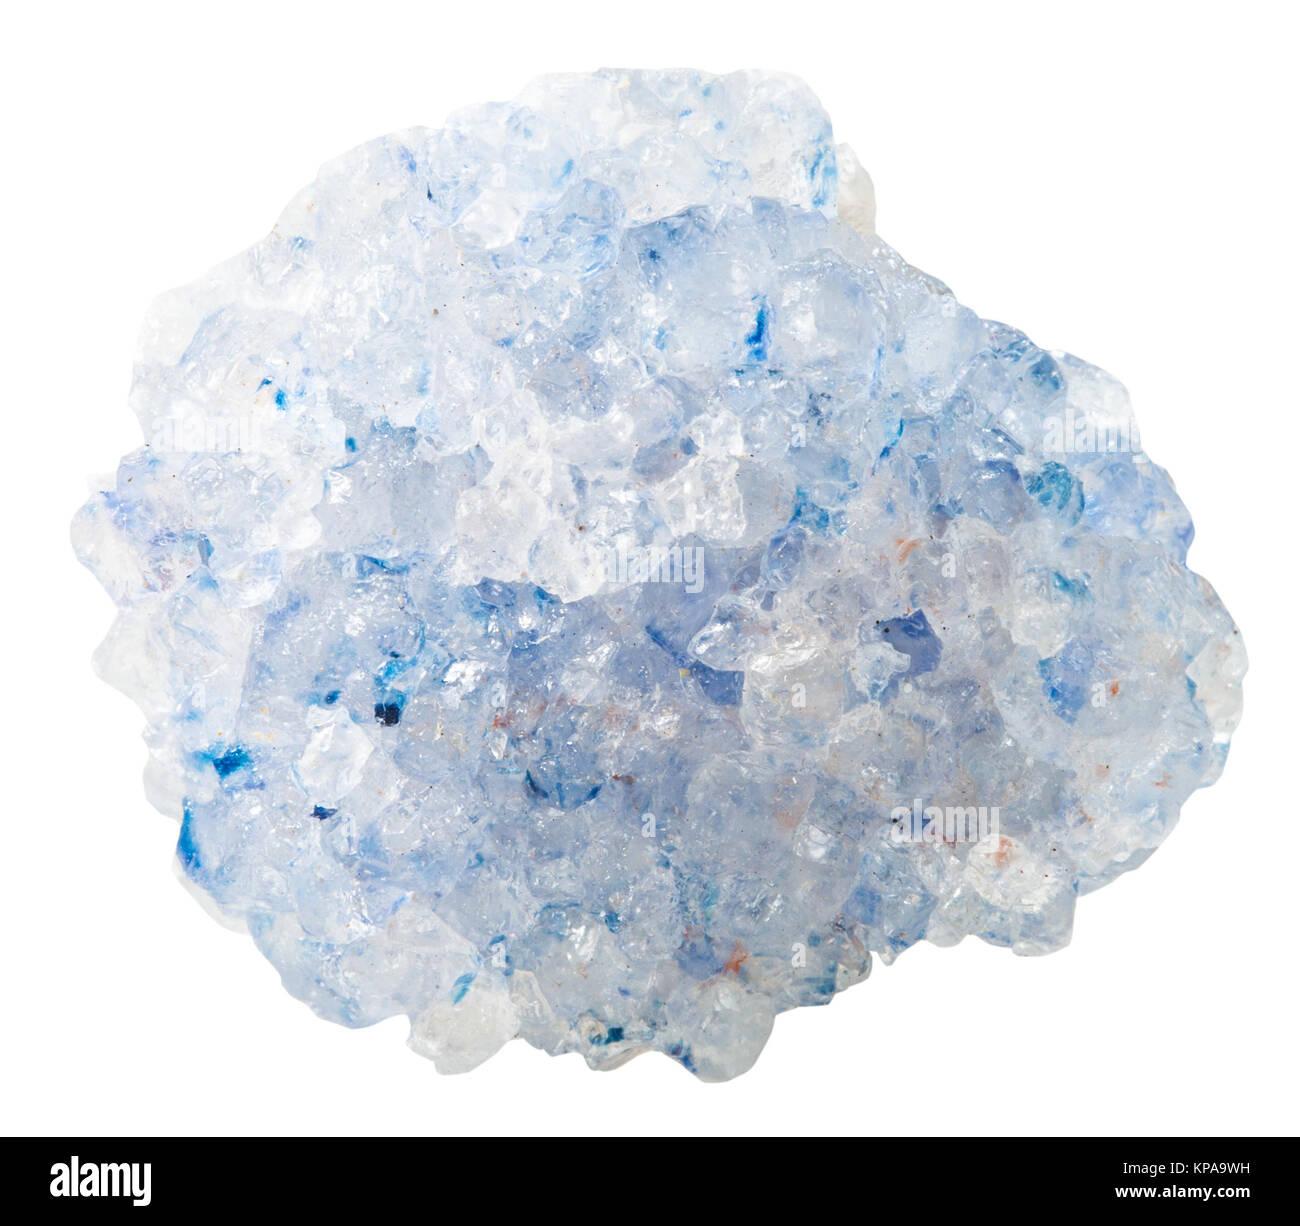 druse of blue Celestine (celestite) mineral stone - Stock Image